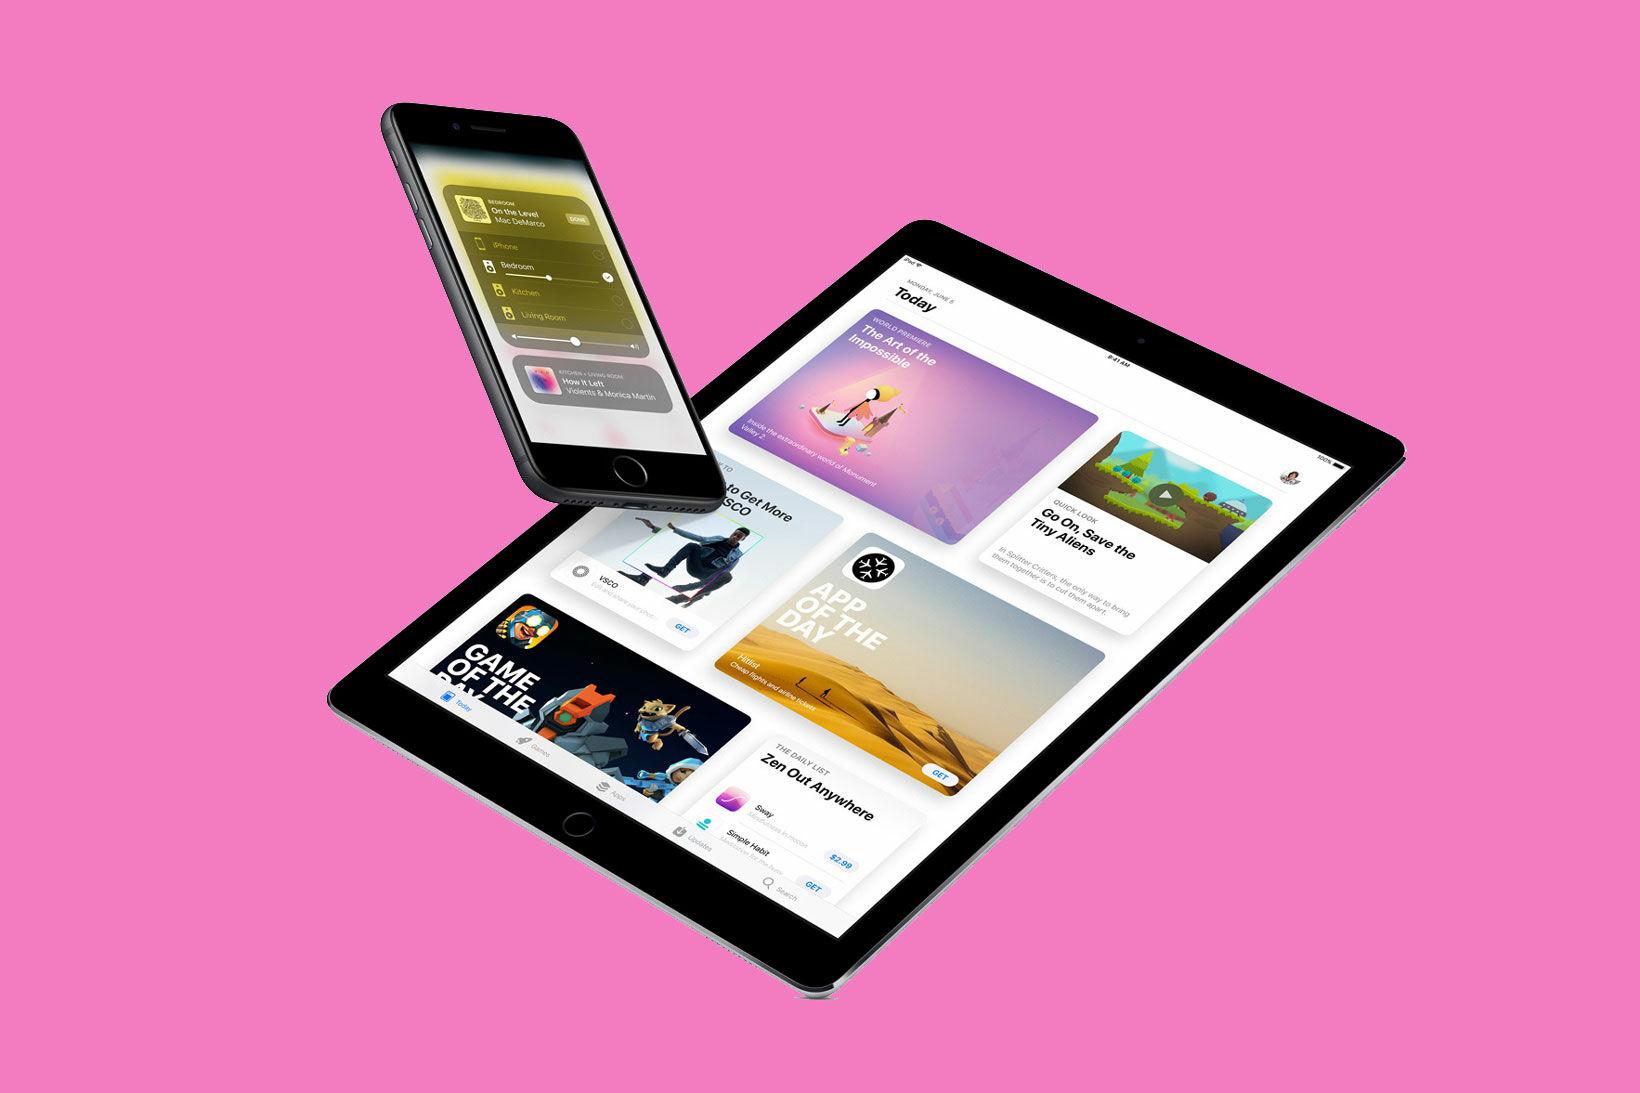 Perangkat Apple Yang Mendapatkan Update Ios 11